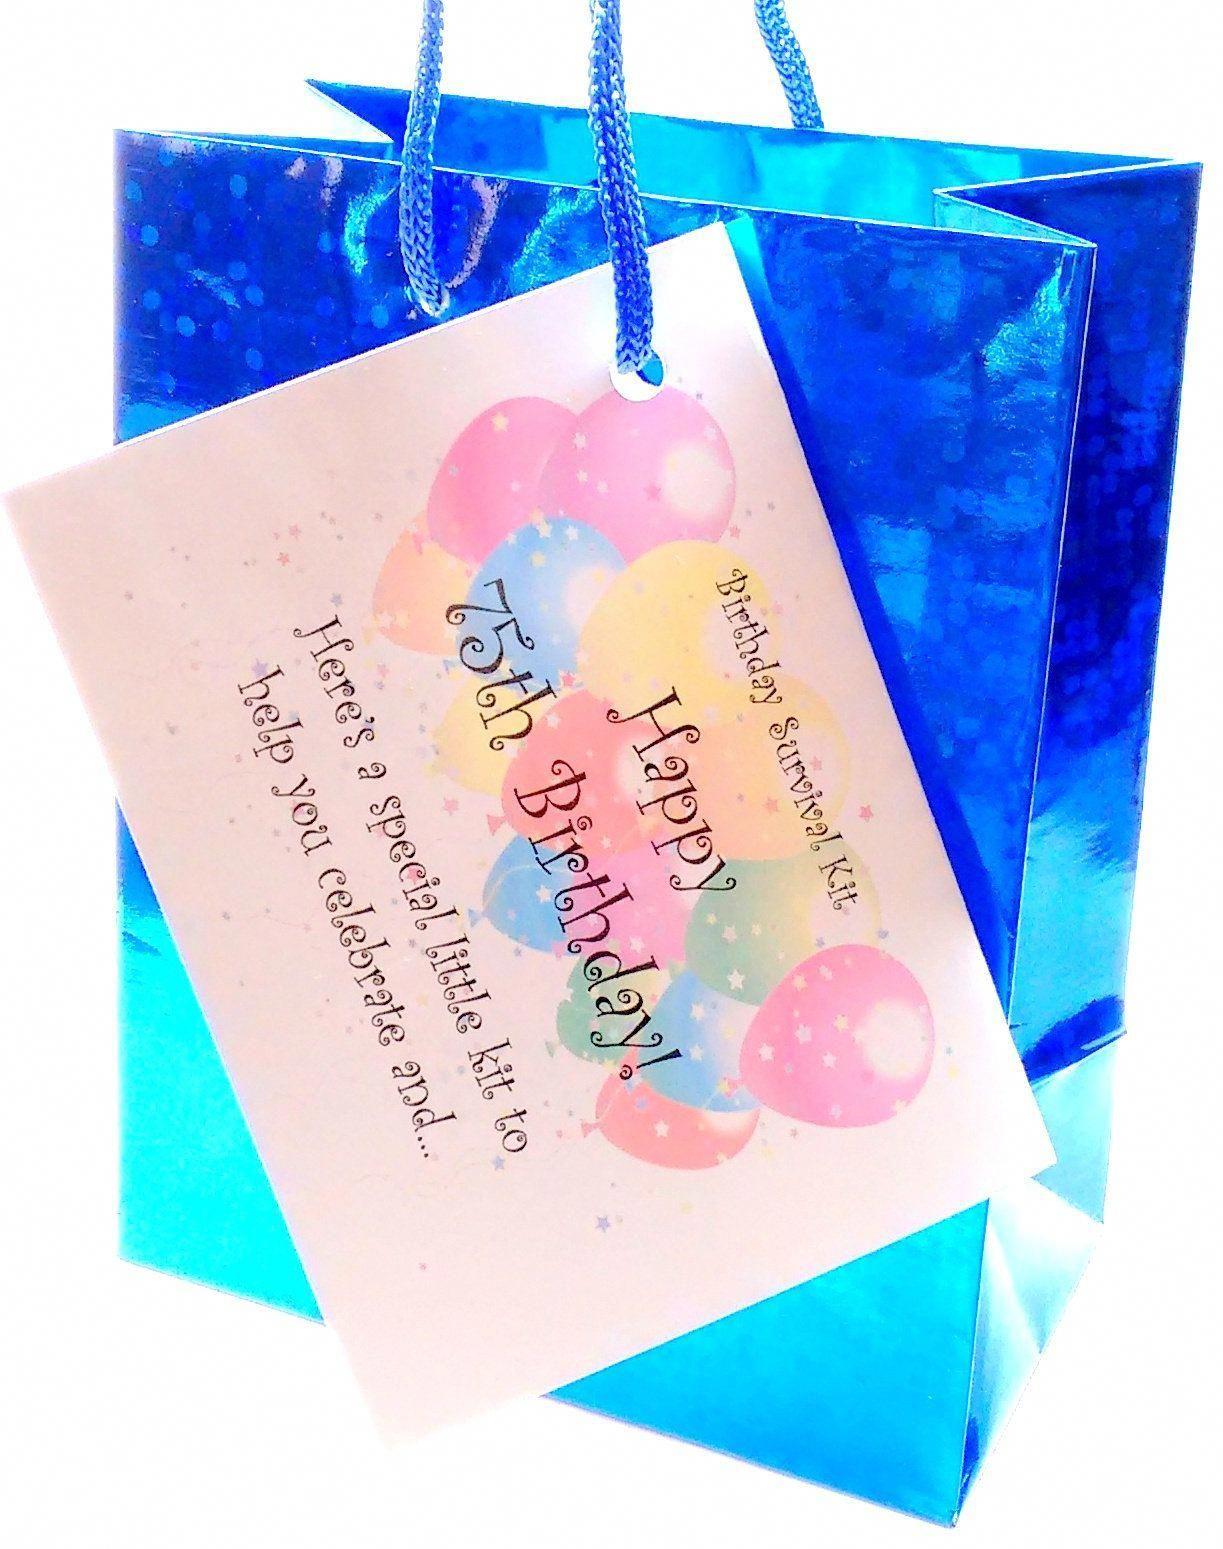 75th birthday survival kit giftcard fun present forhim